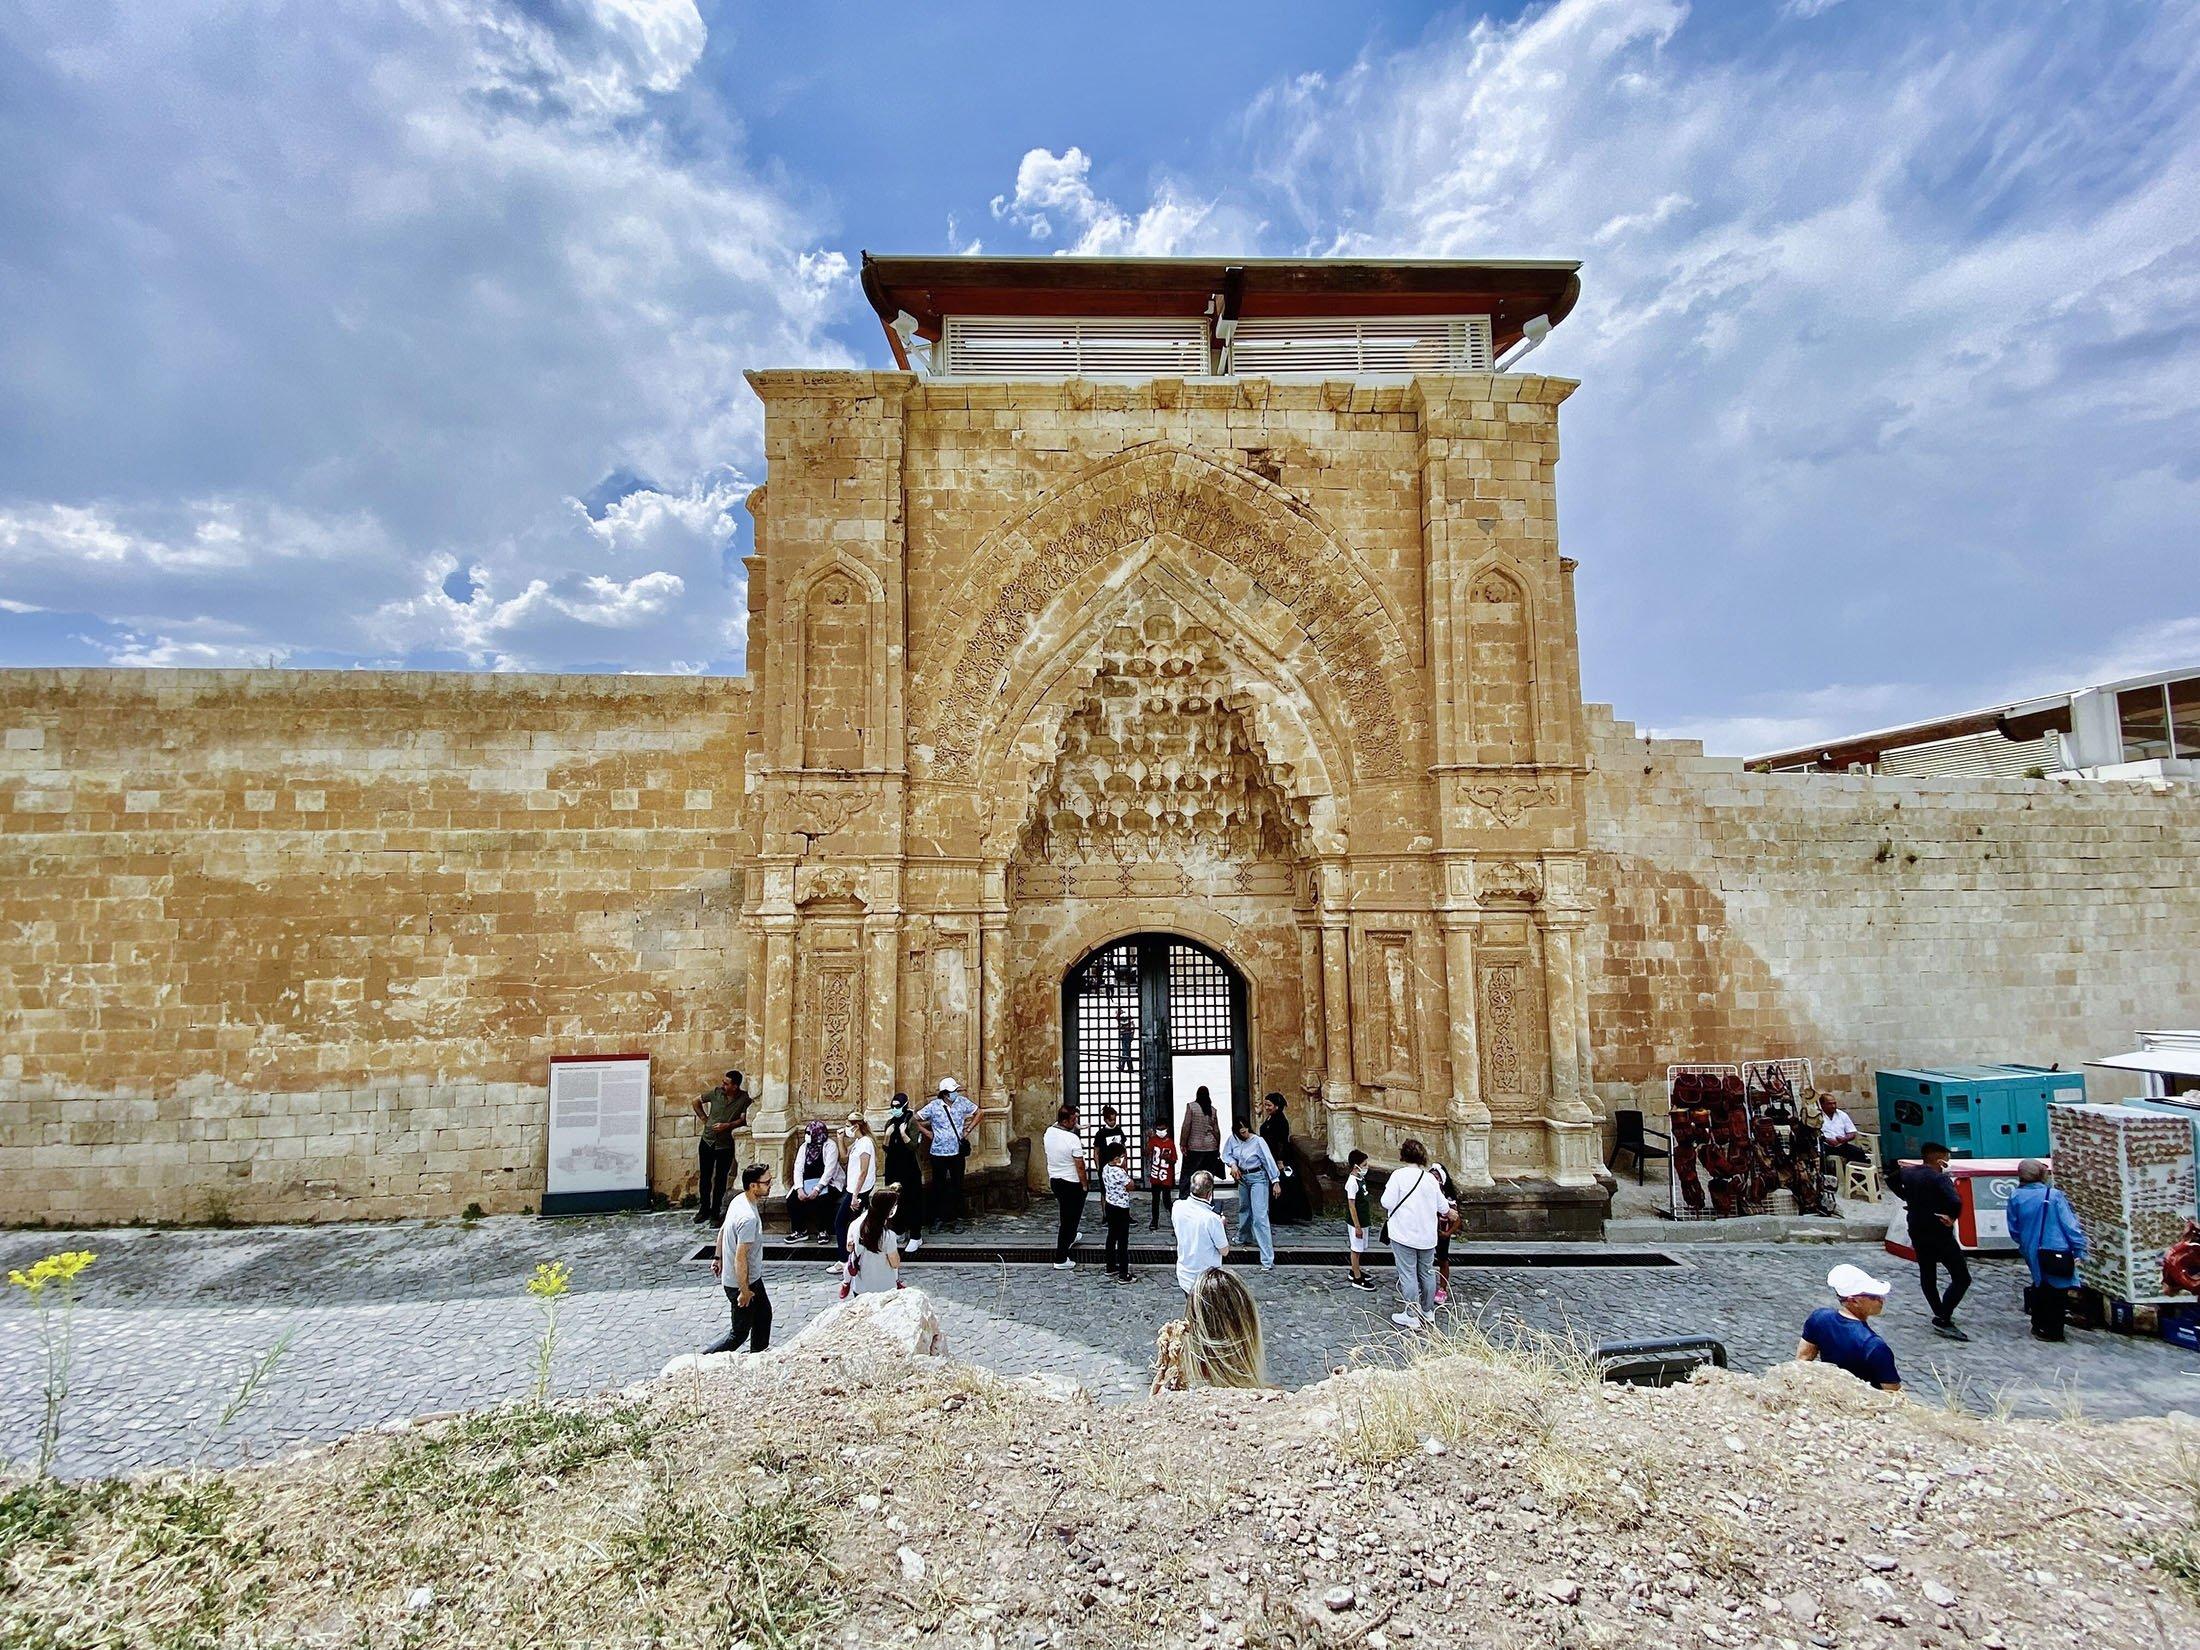 People walk through the grand main gate of the Ishak Pasha Palace can be seen from afar in theDoğubayazıt district of Ağrı, Turkey, July 30, 2021. (IHA Photo)